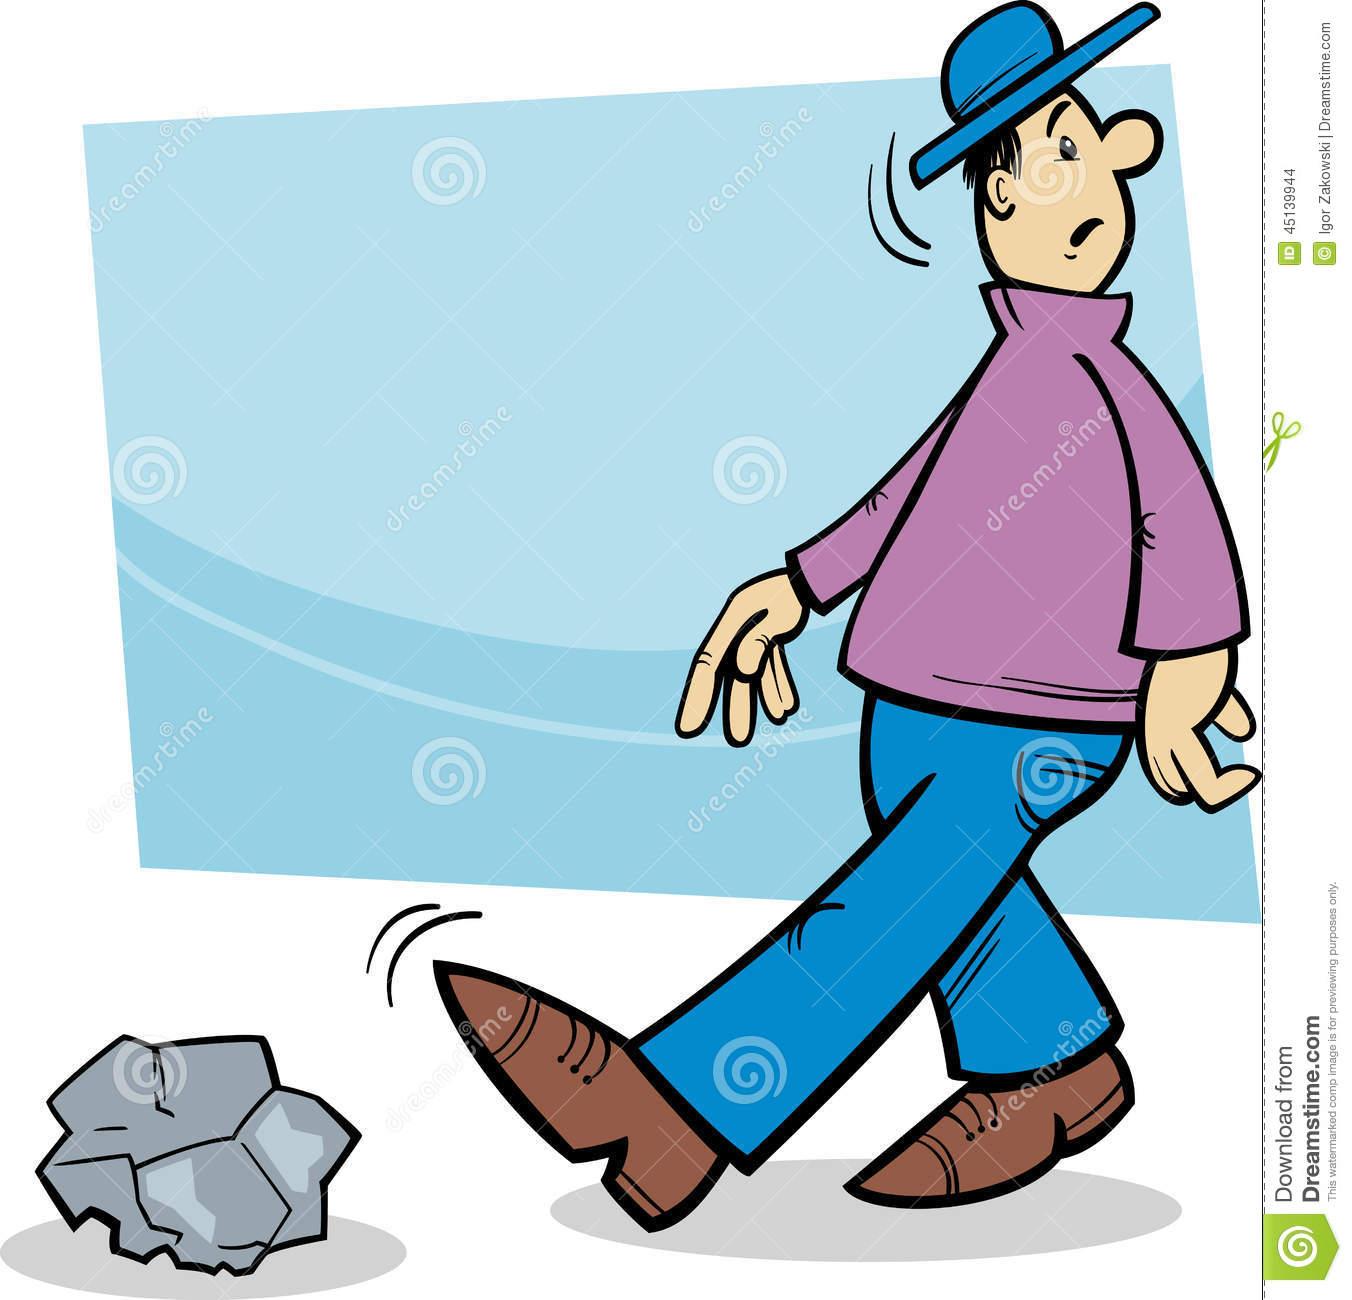 Stumbling stone clipart #19